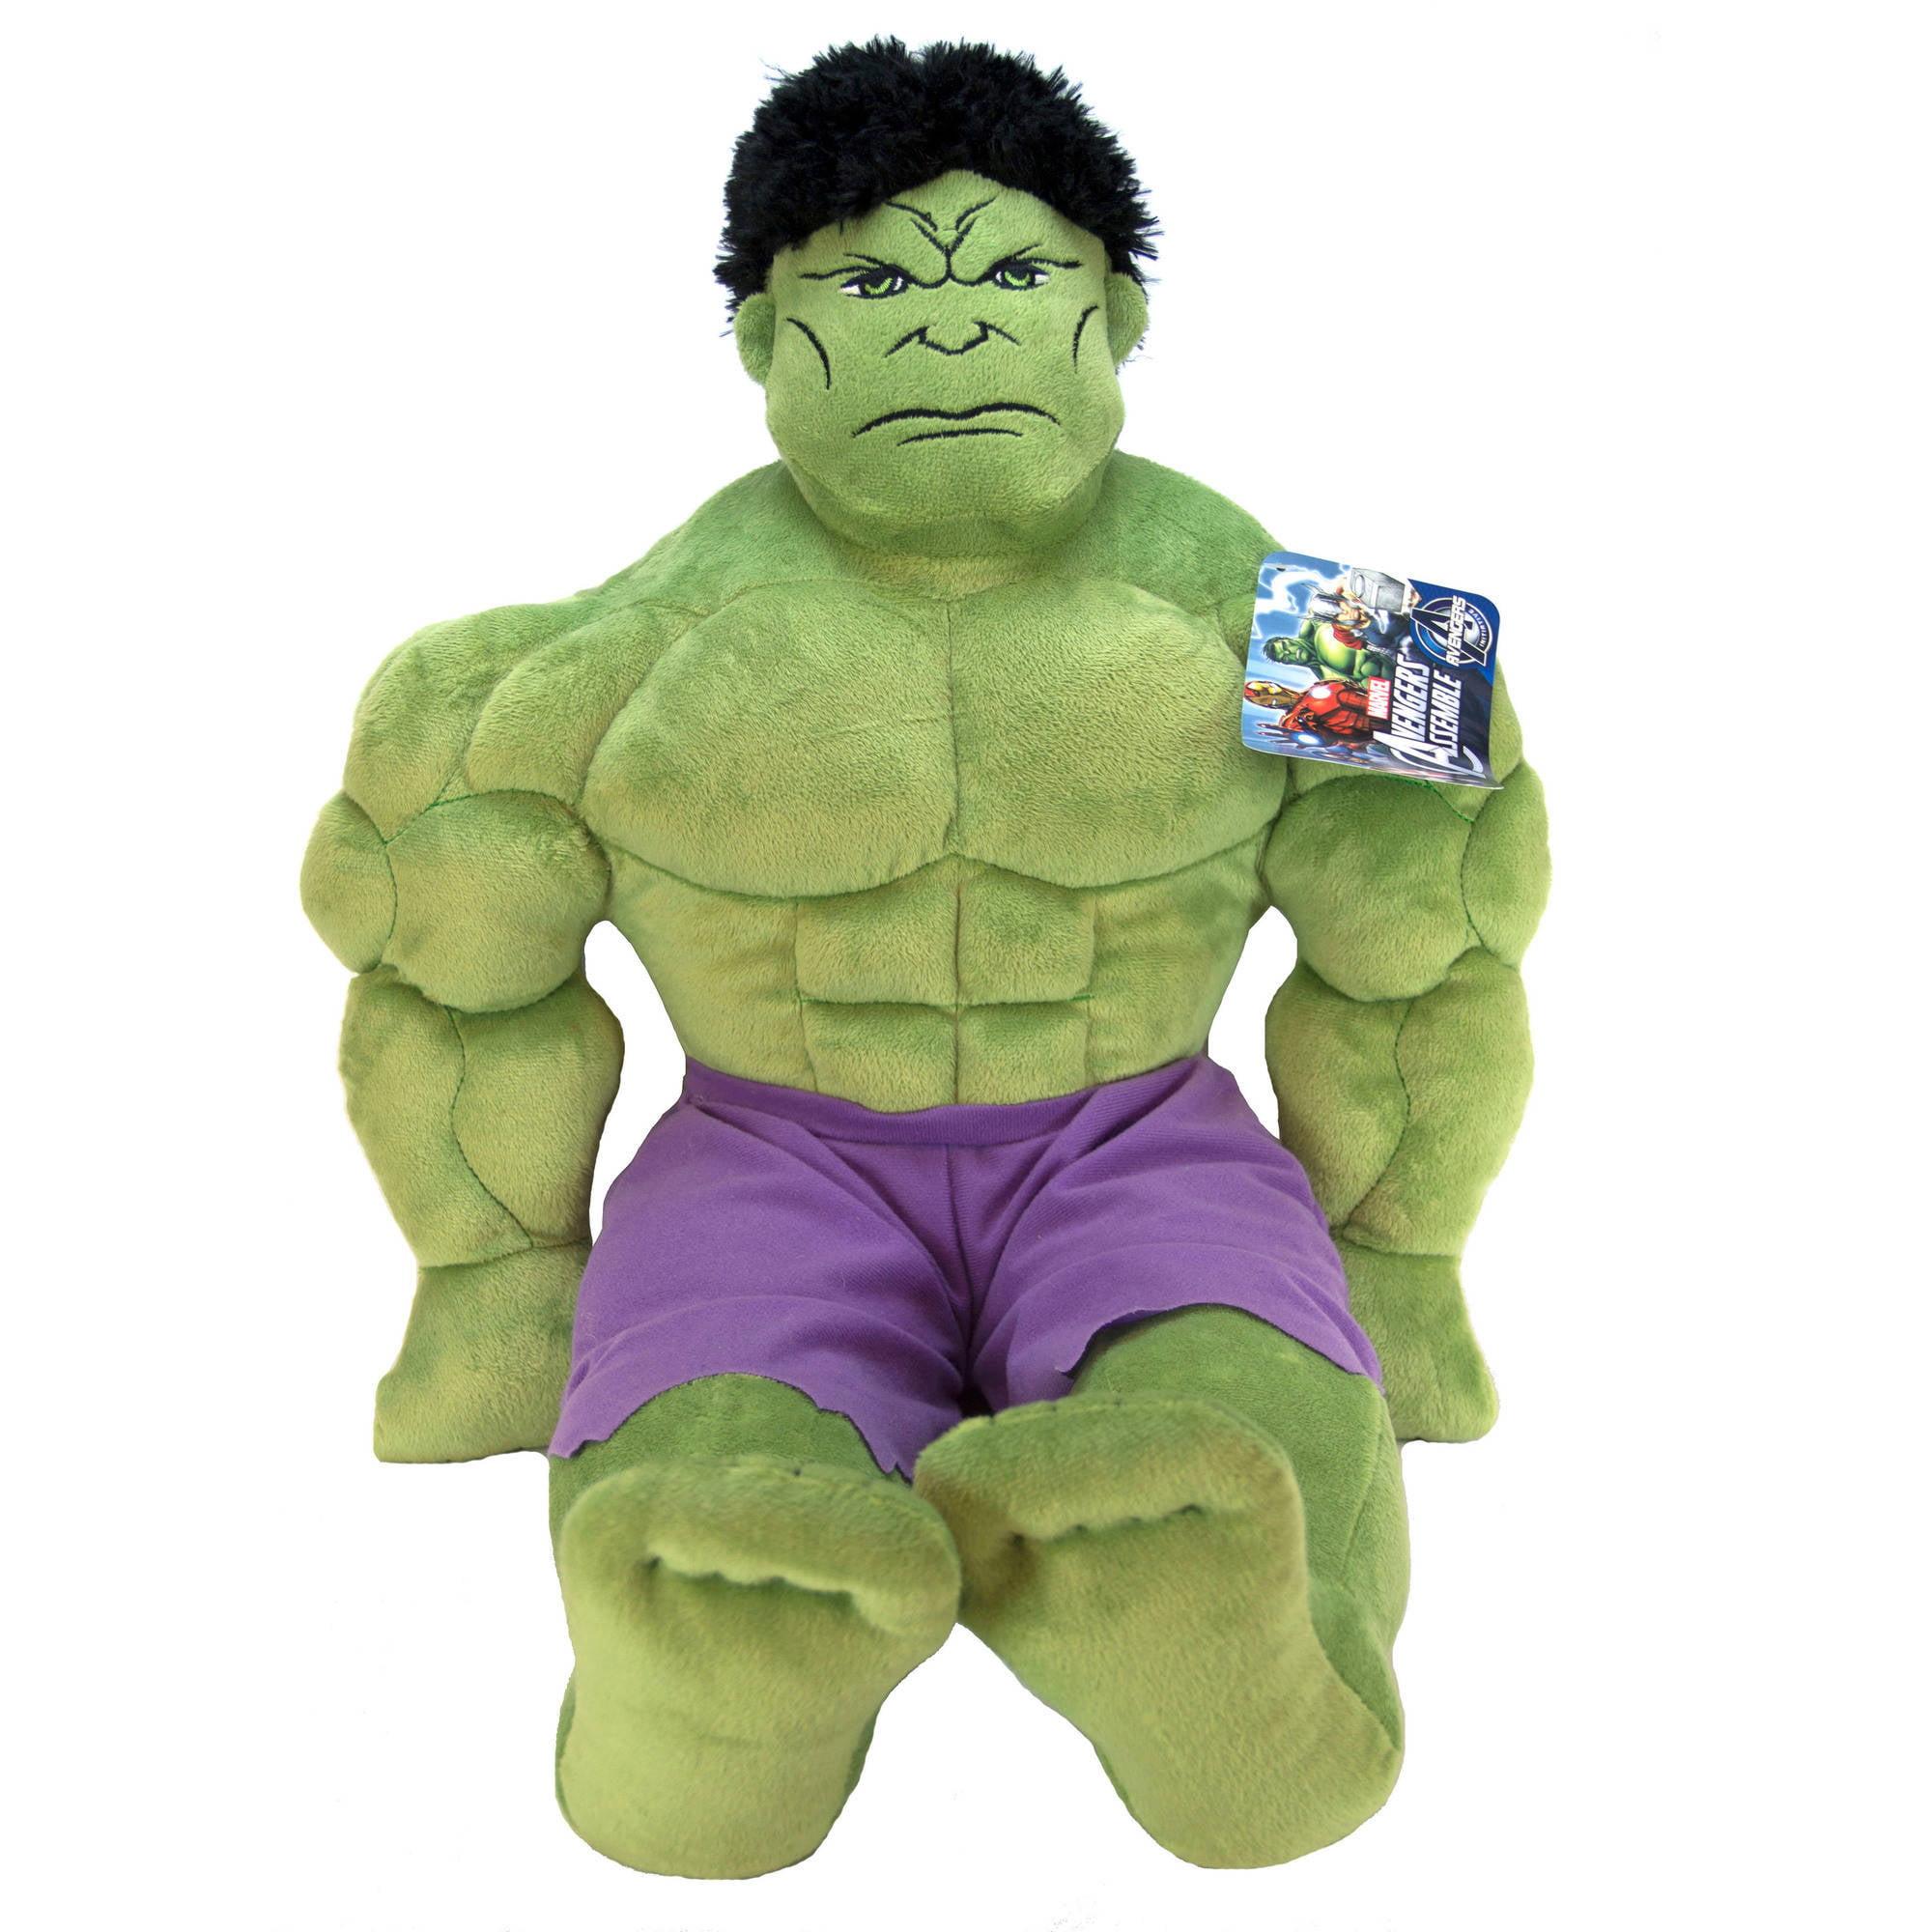 Marvel Avengers Hulk Pillow Buddy Walmartcom